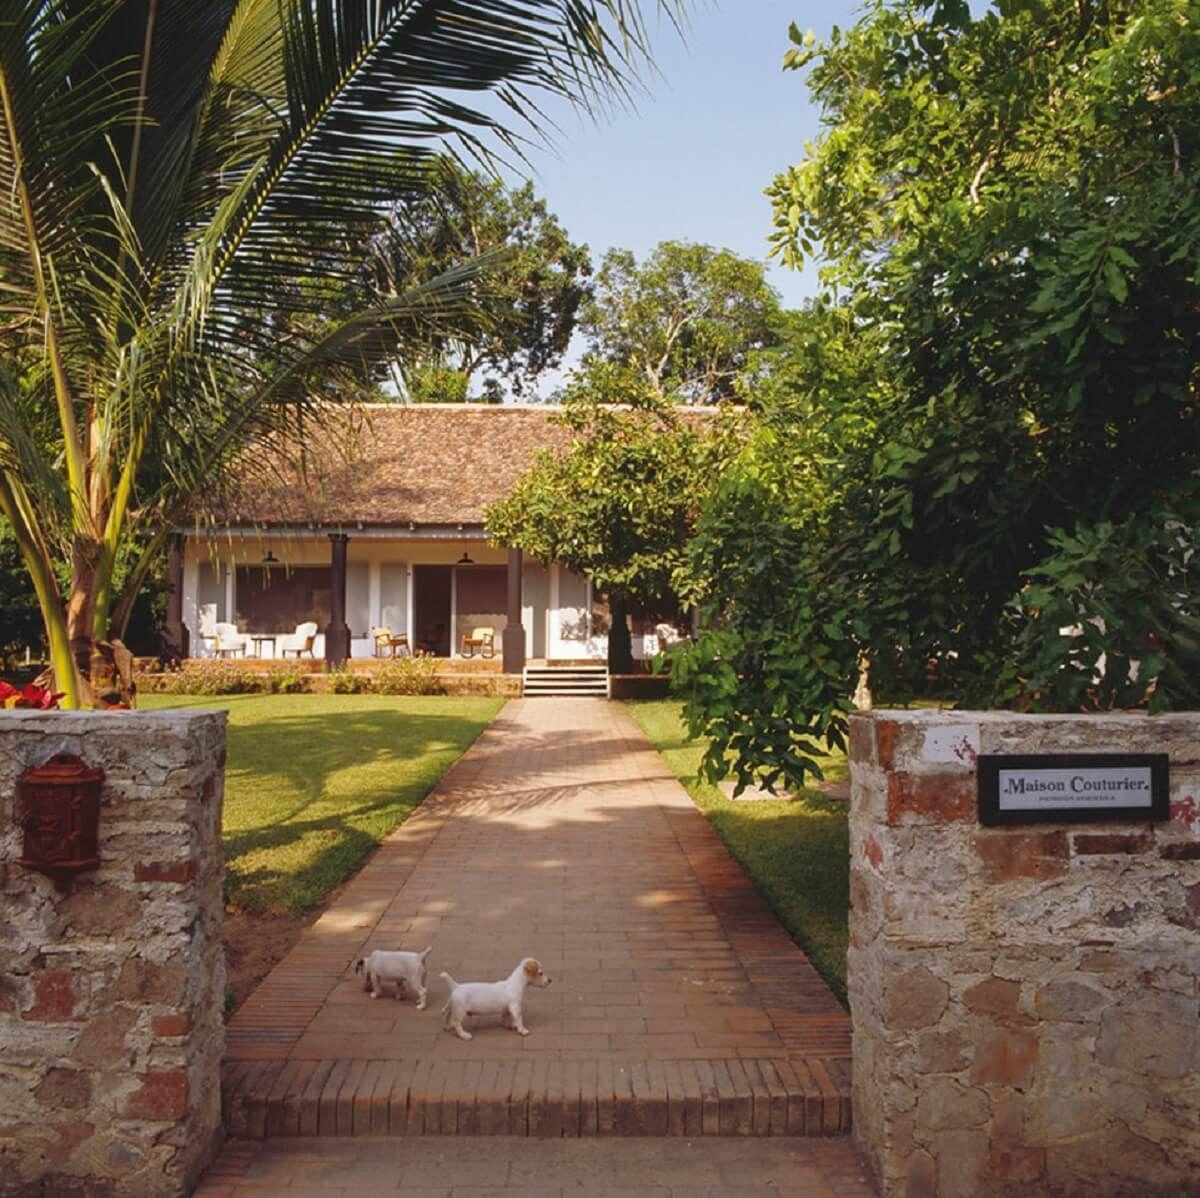 veracruz-san rafael-maison coutourier-mexico